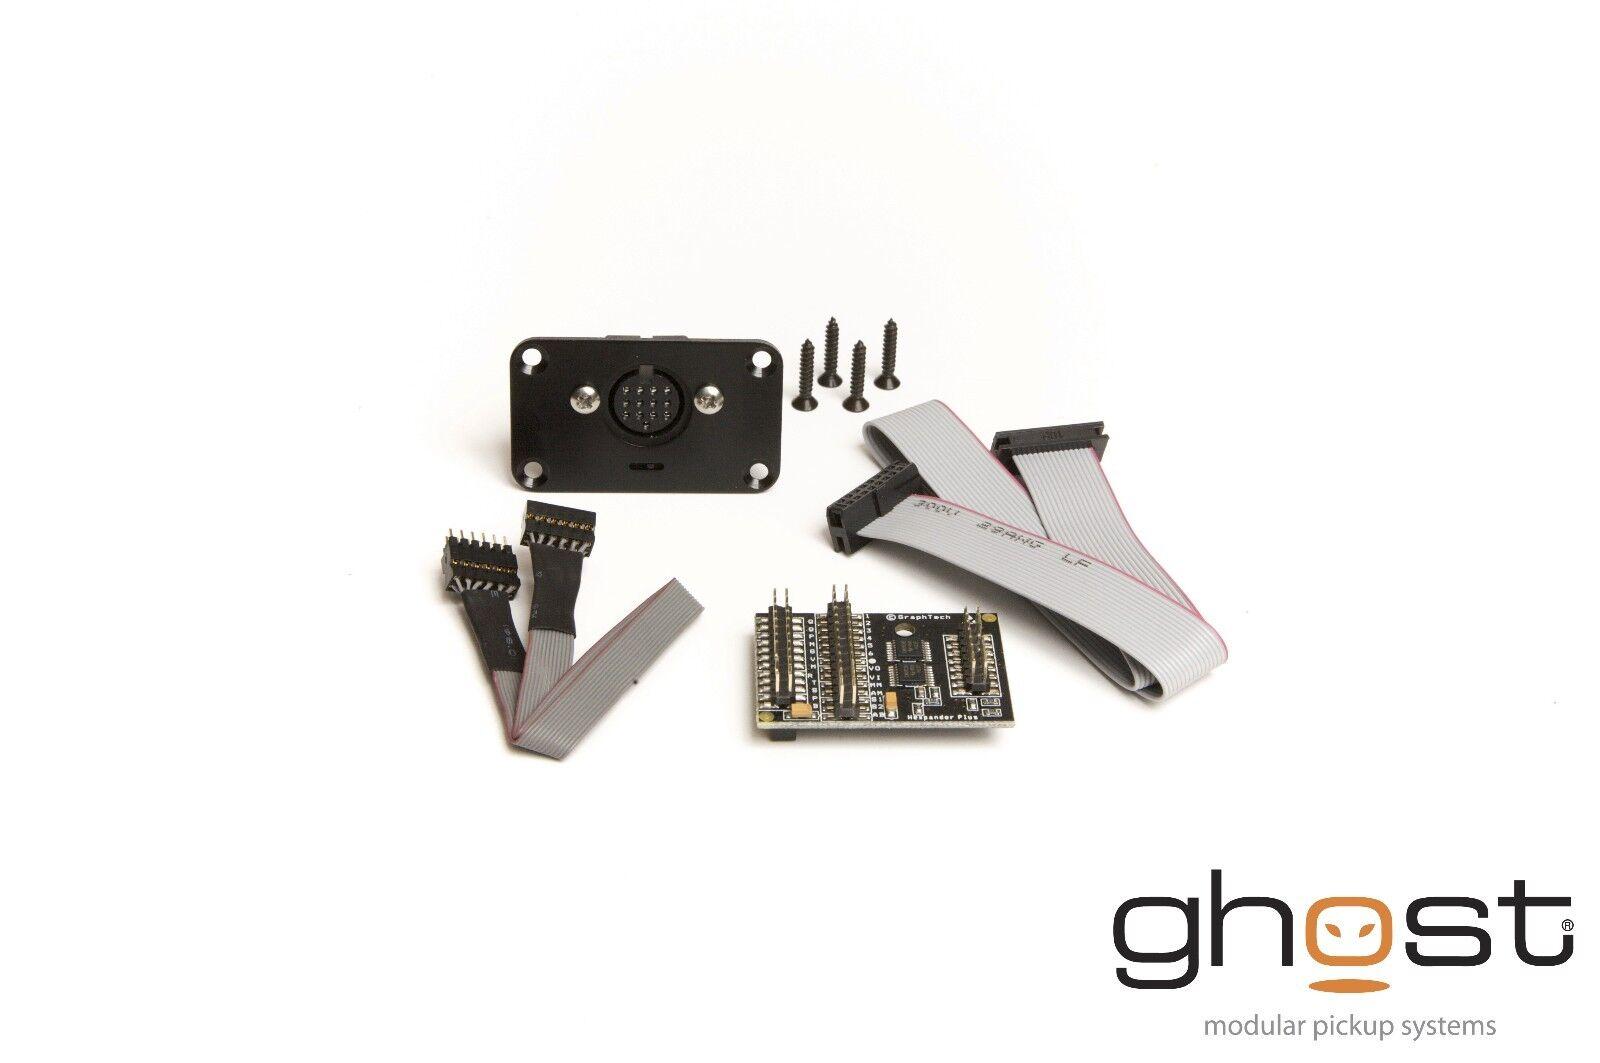 Graph Tech Tech Tech Ghost hexpander Kit de preamplificador pe-0440-00 - Basic-Nuevo, Auth DISTRIBUIDOR 1c21a7